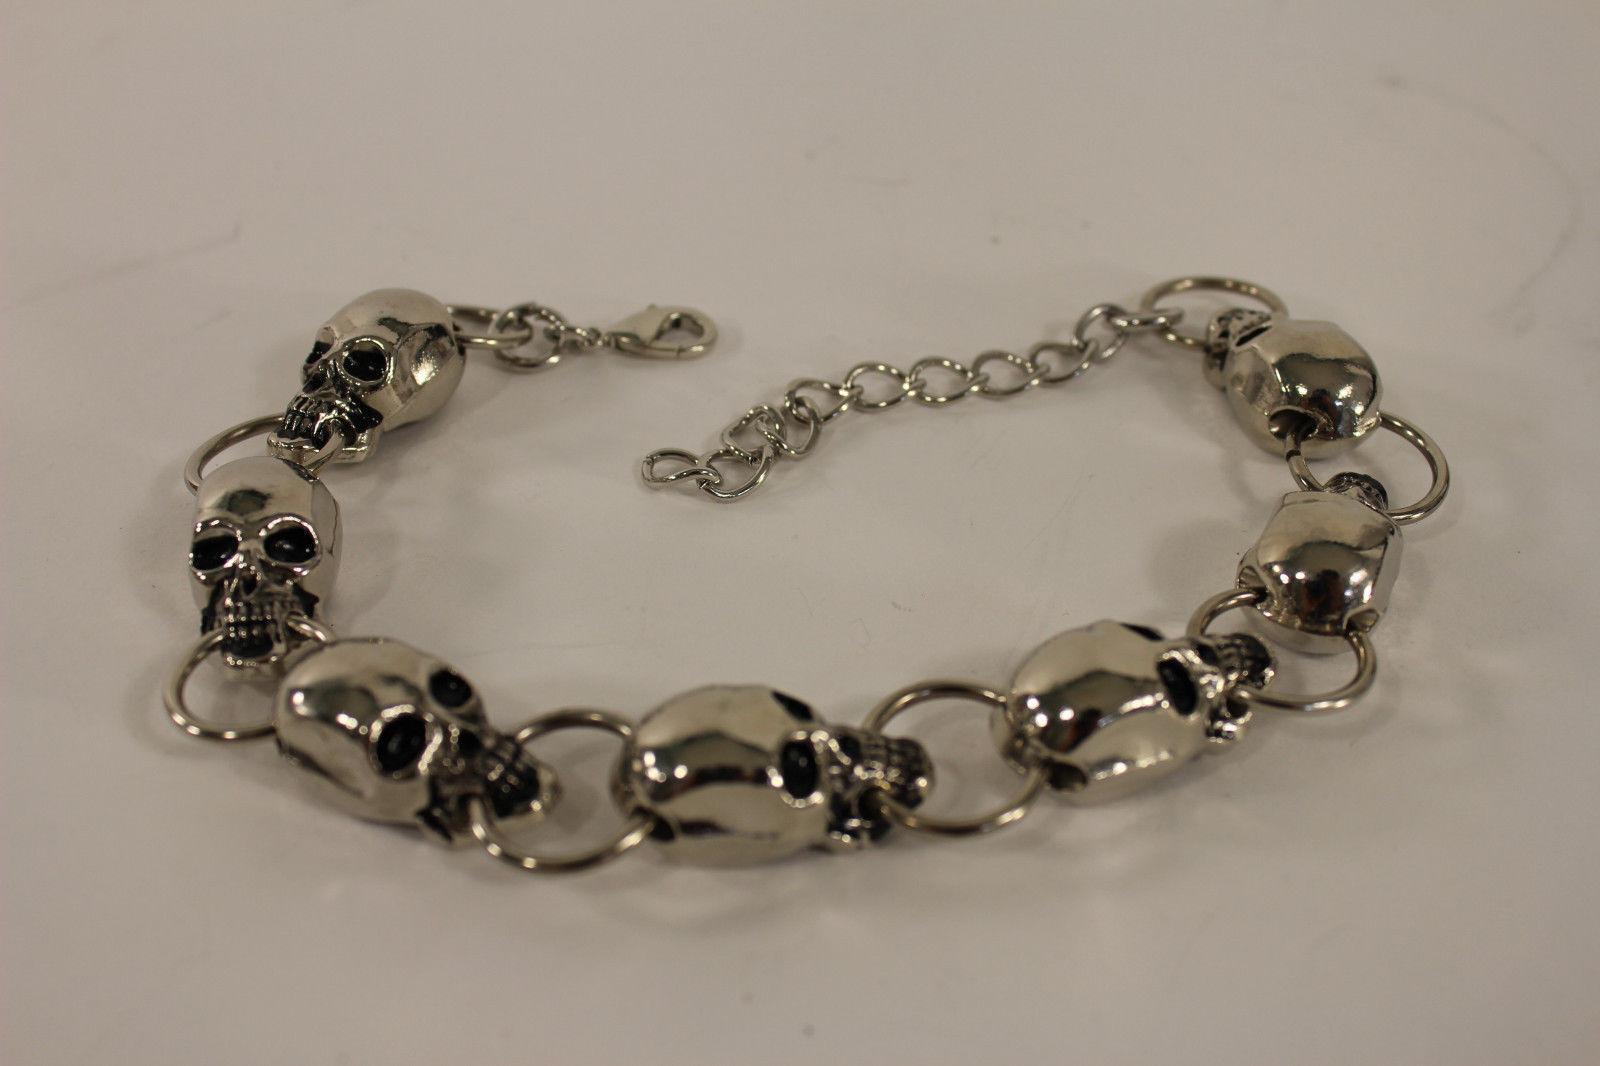 Women Boot Chain Bracelet Western Charm Jewelry Silver Skeleton Skull Pirates